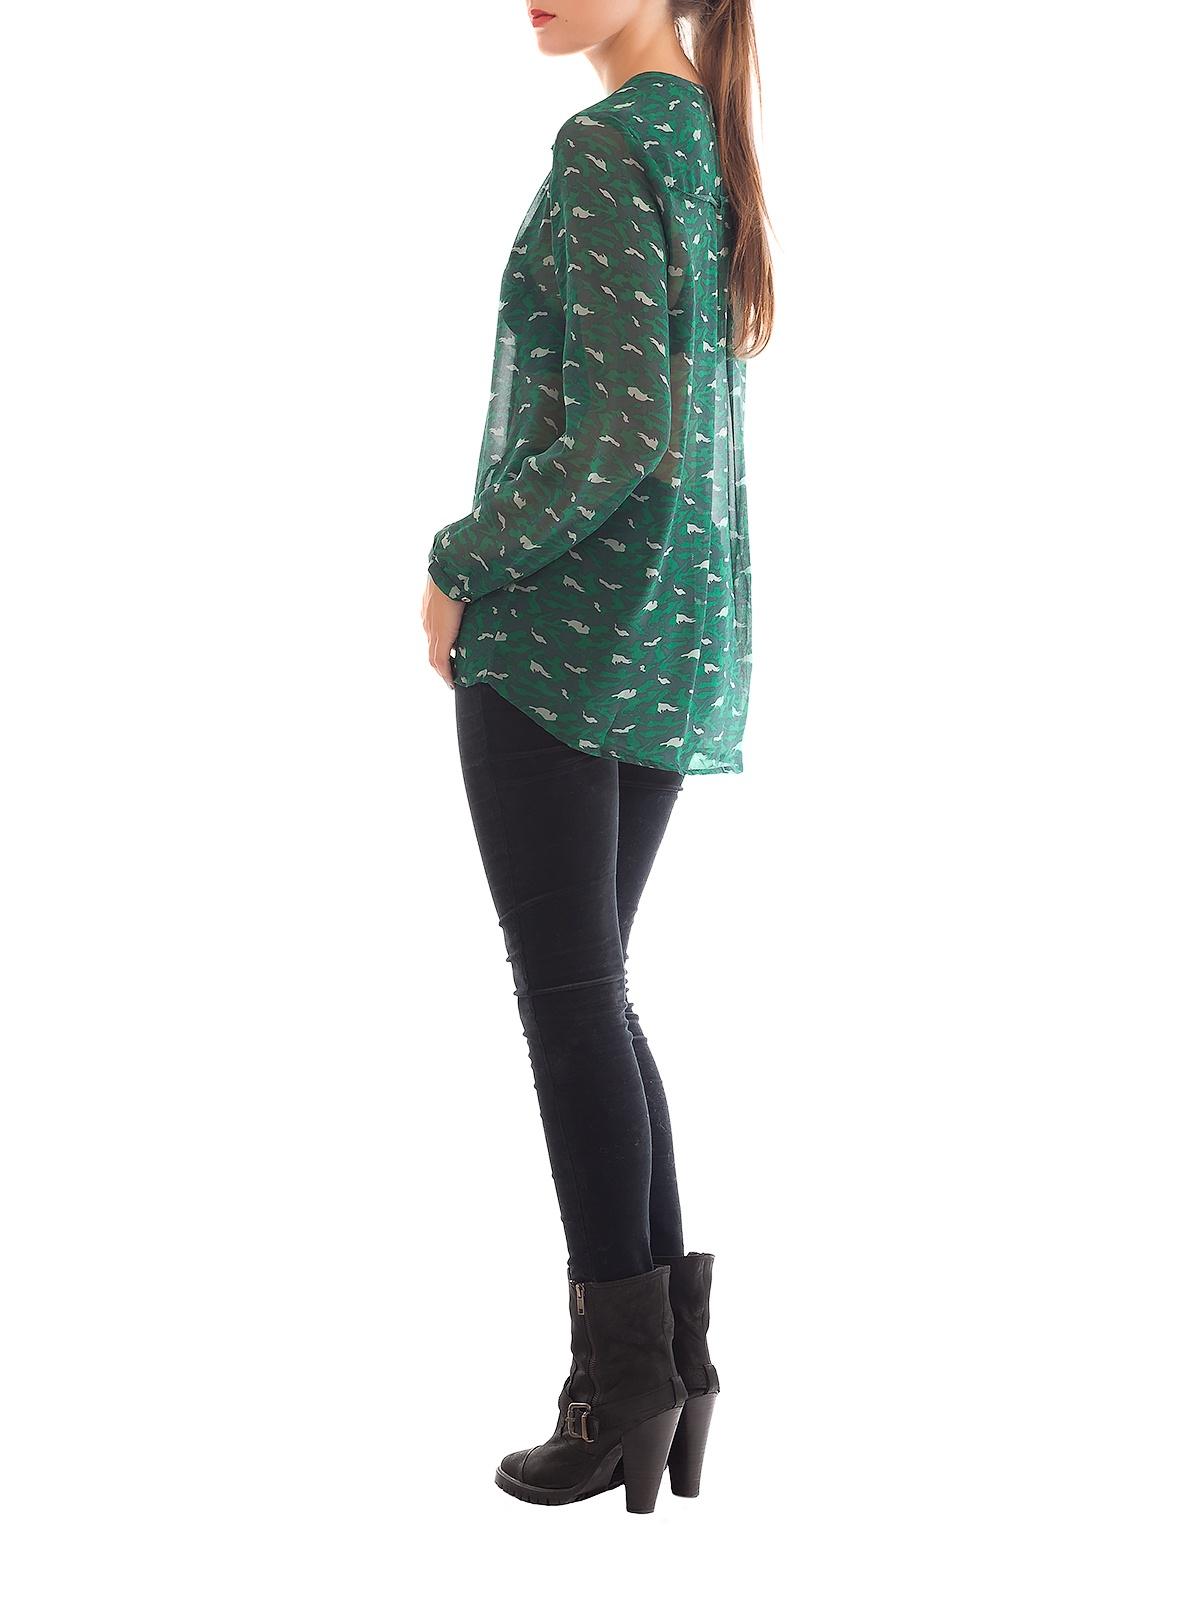 Custommade | ALIA CAMOUFLAGE SHIRT | GIRISSIMA.COM